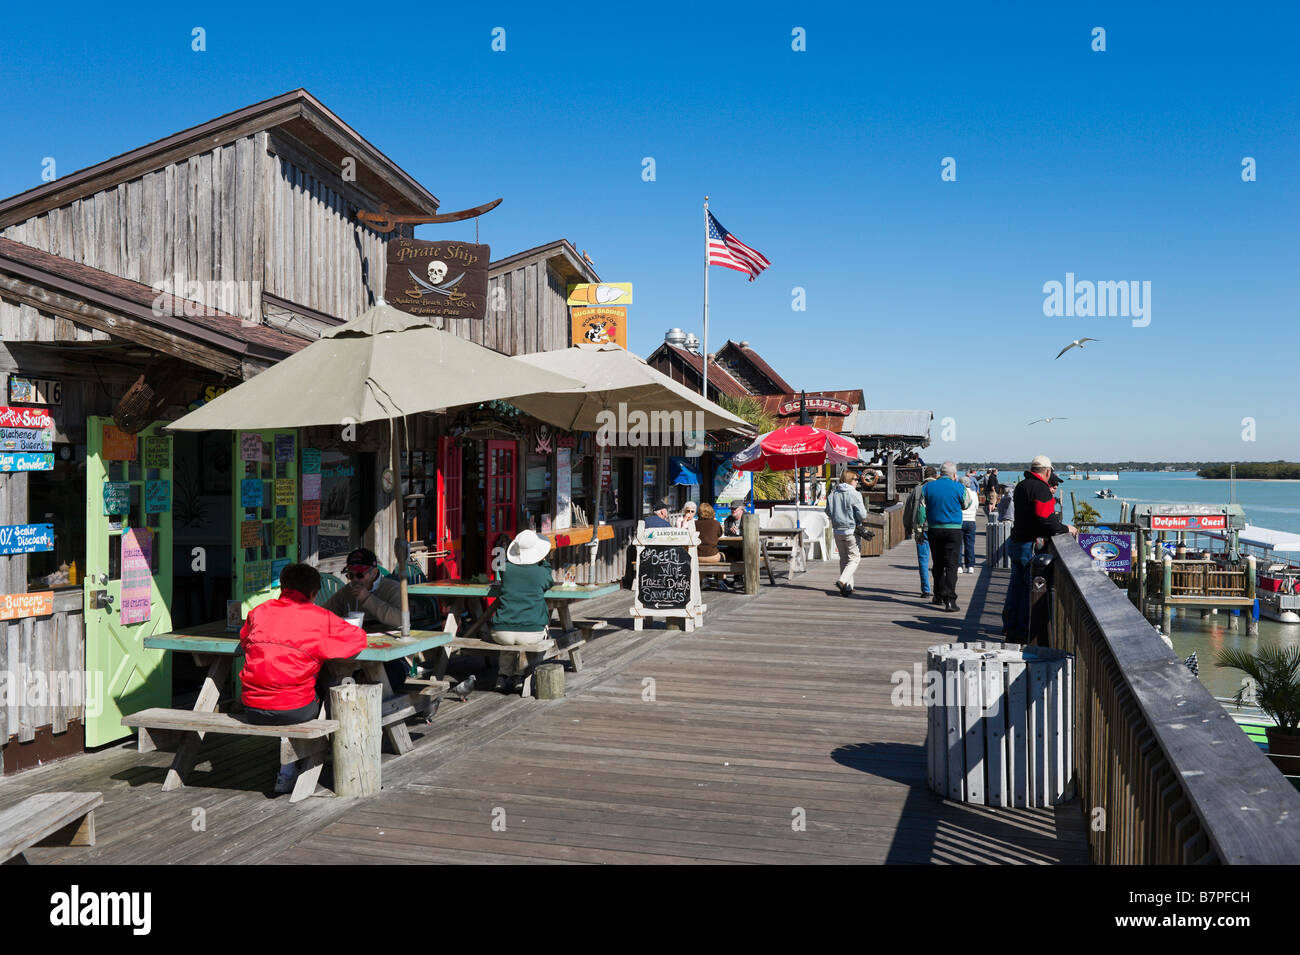 Johns Island Marina Restaurant